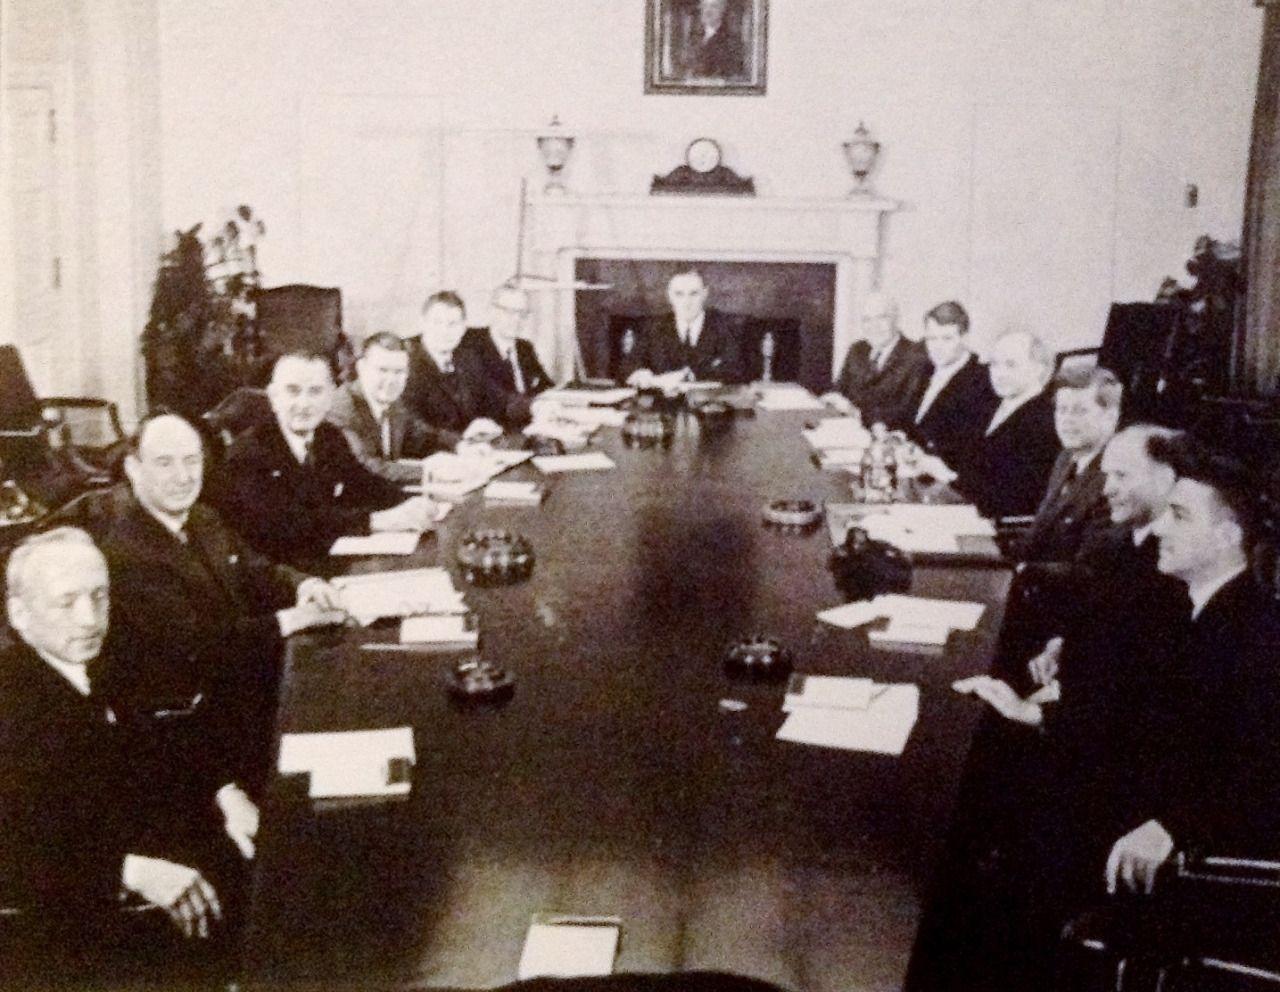 JFK's first Cabinet meeting,1961 | Jfk | Pinterest | John kennedy